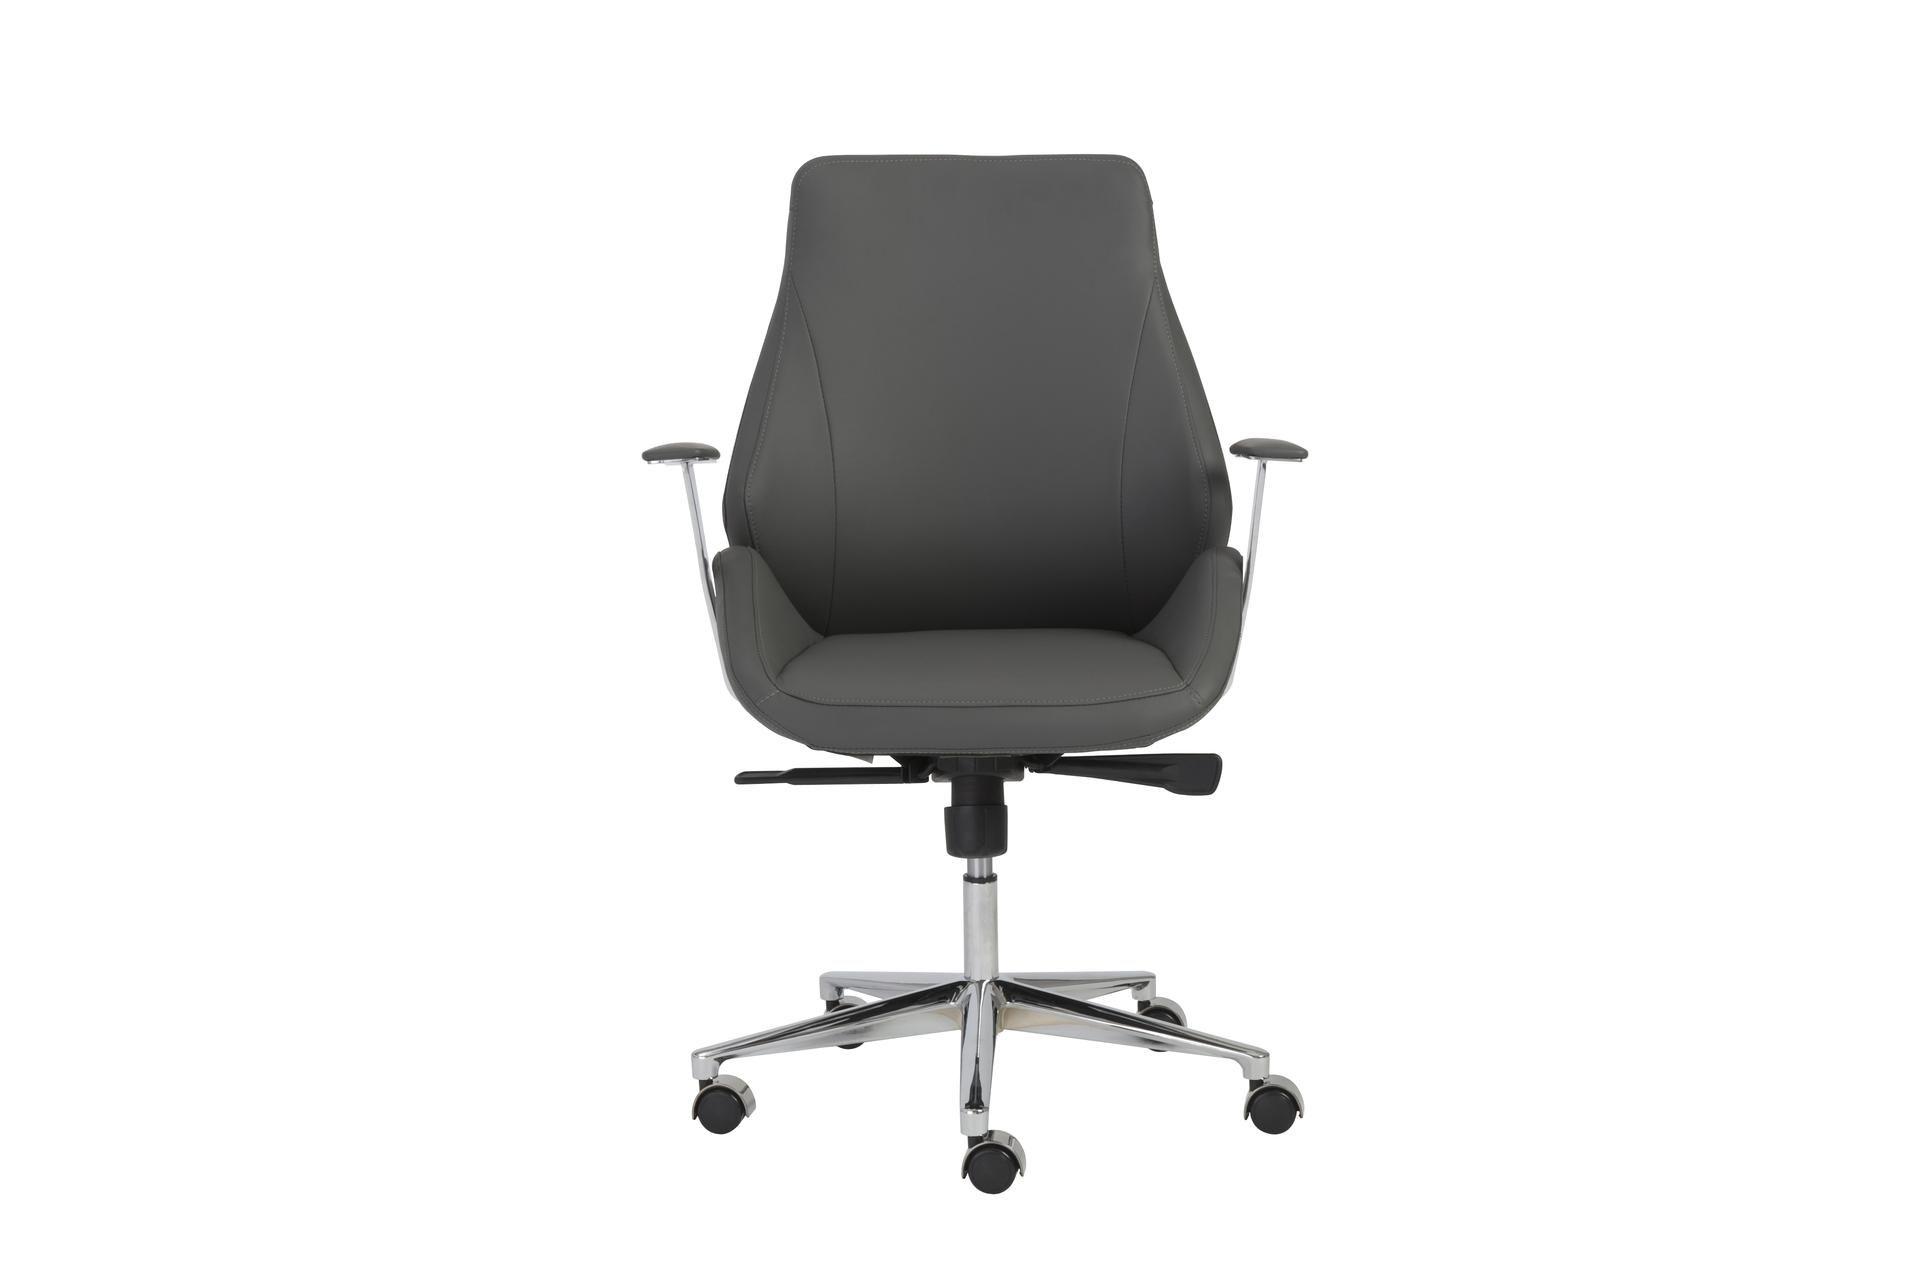 Viborg Grey Vegan And Chrome Low Back Desk Chair - $595